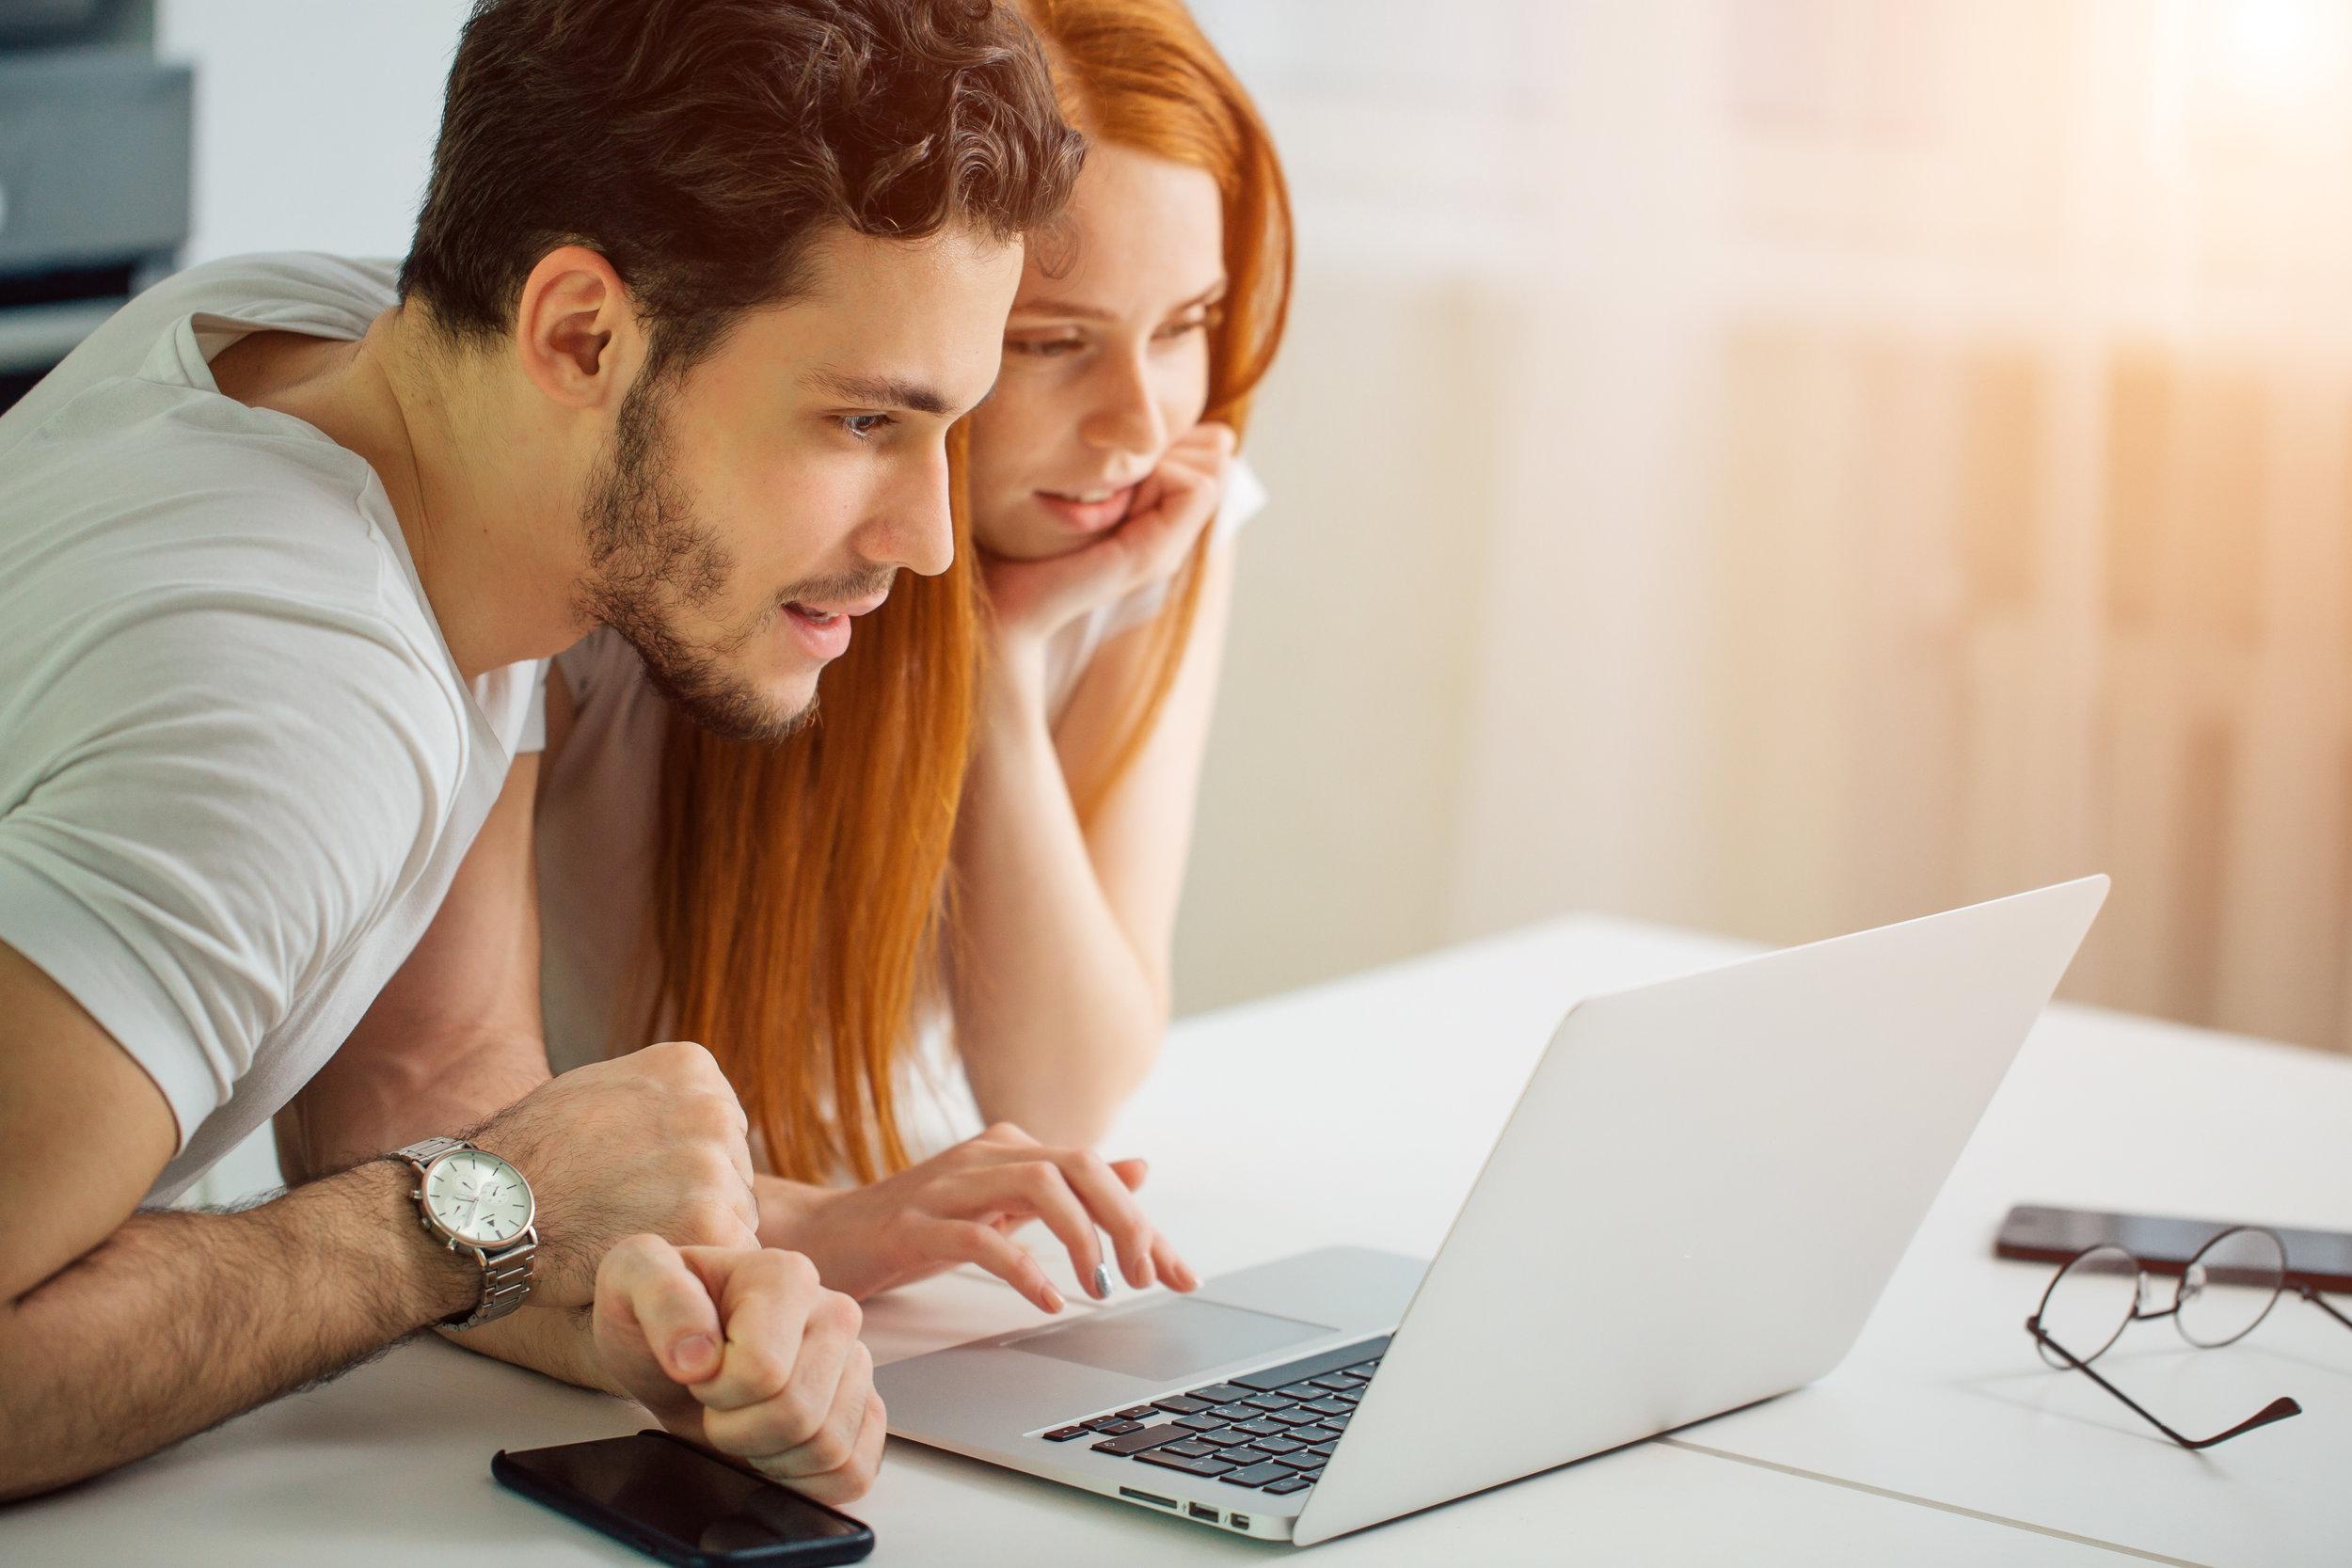 Couple looks at computer.jpeg